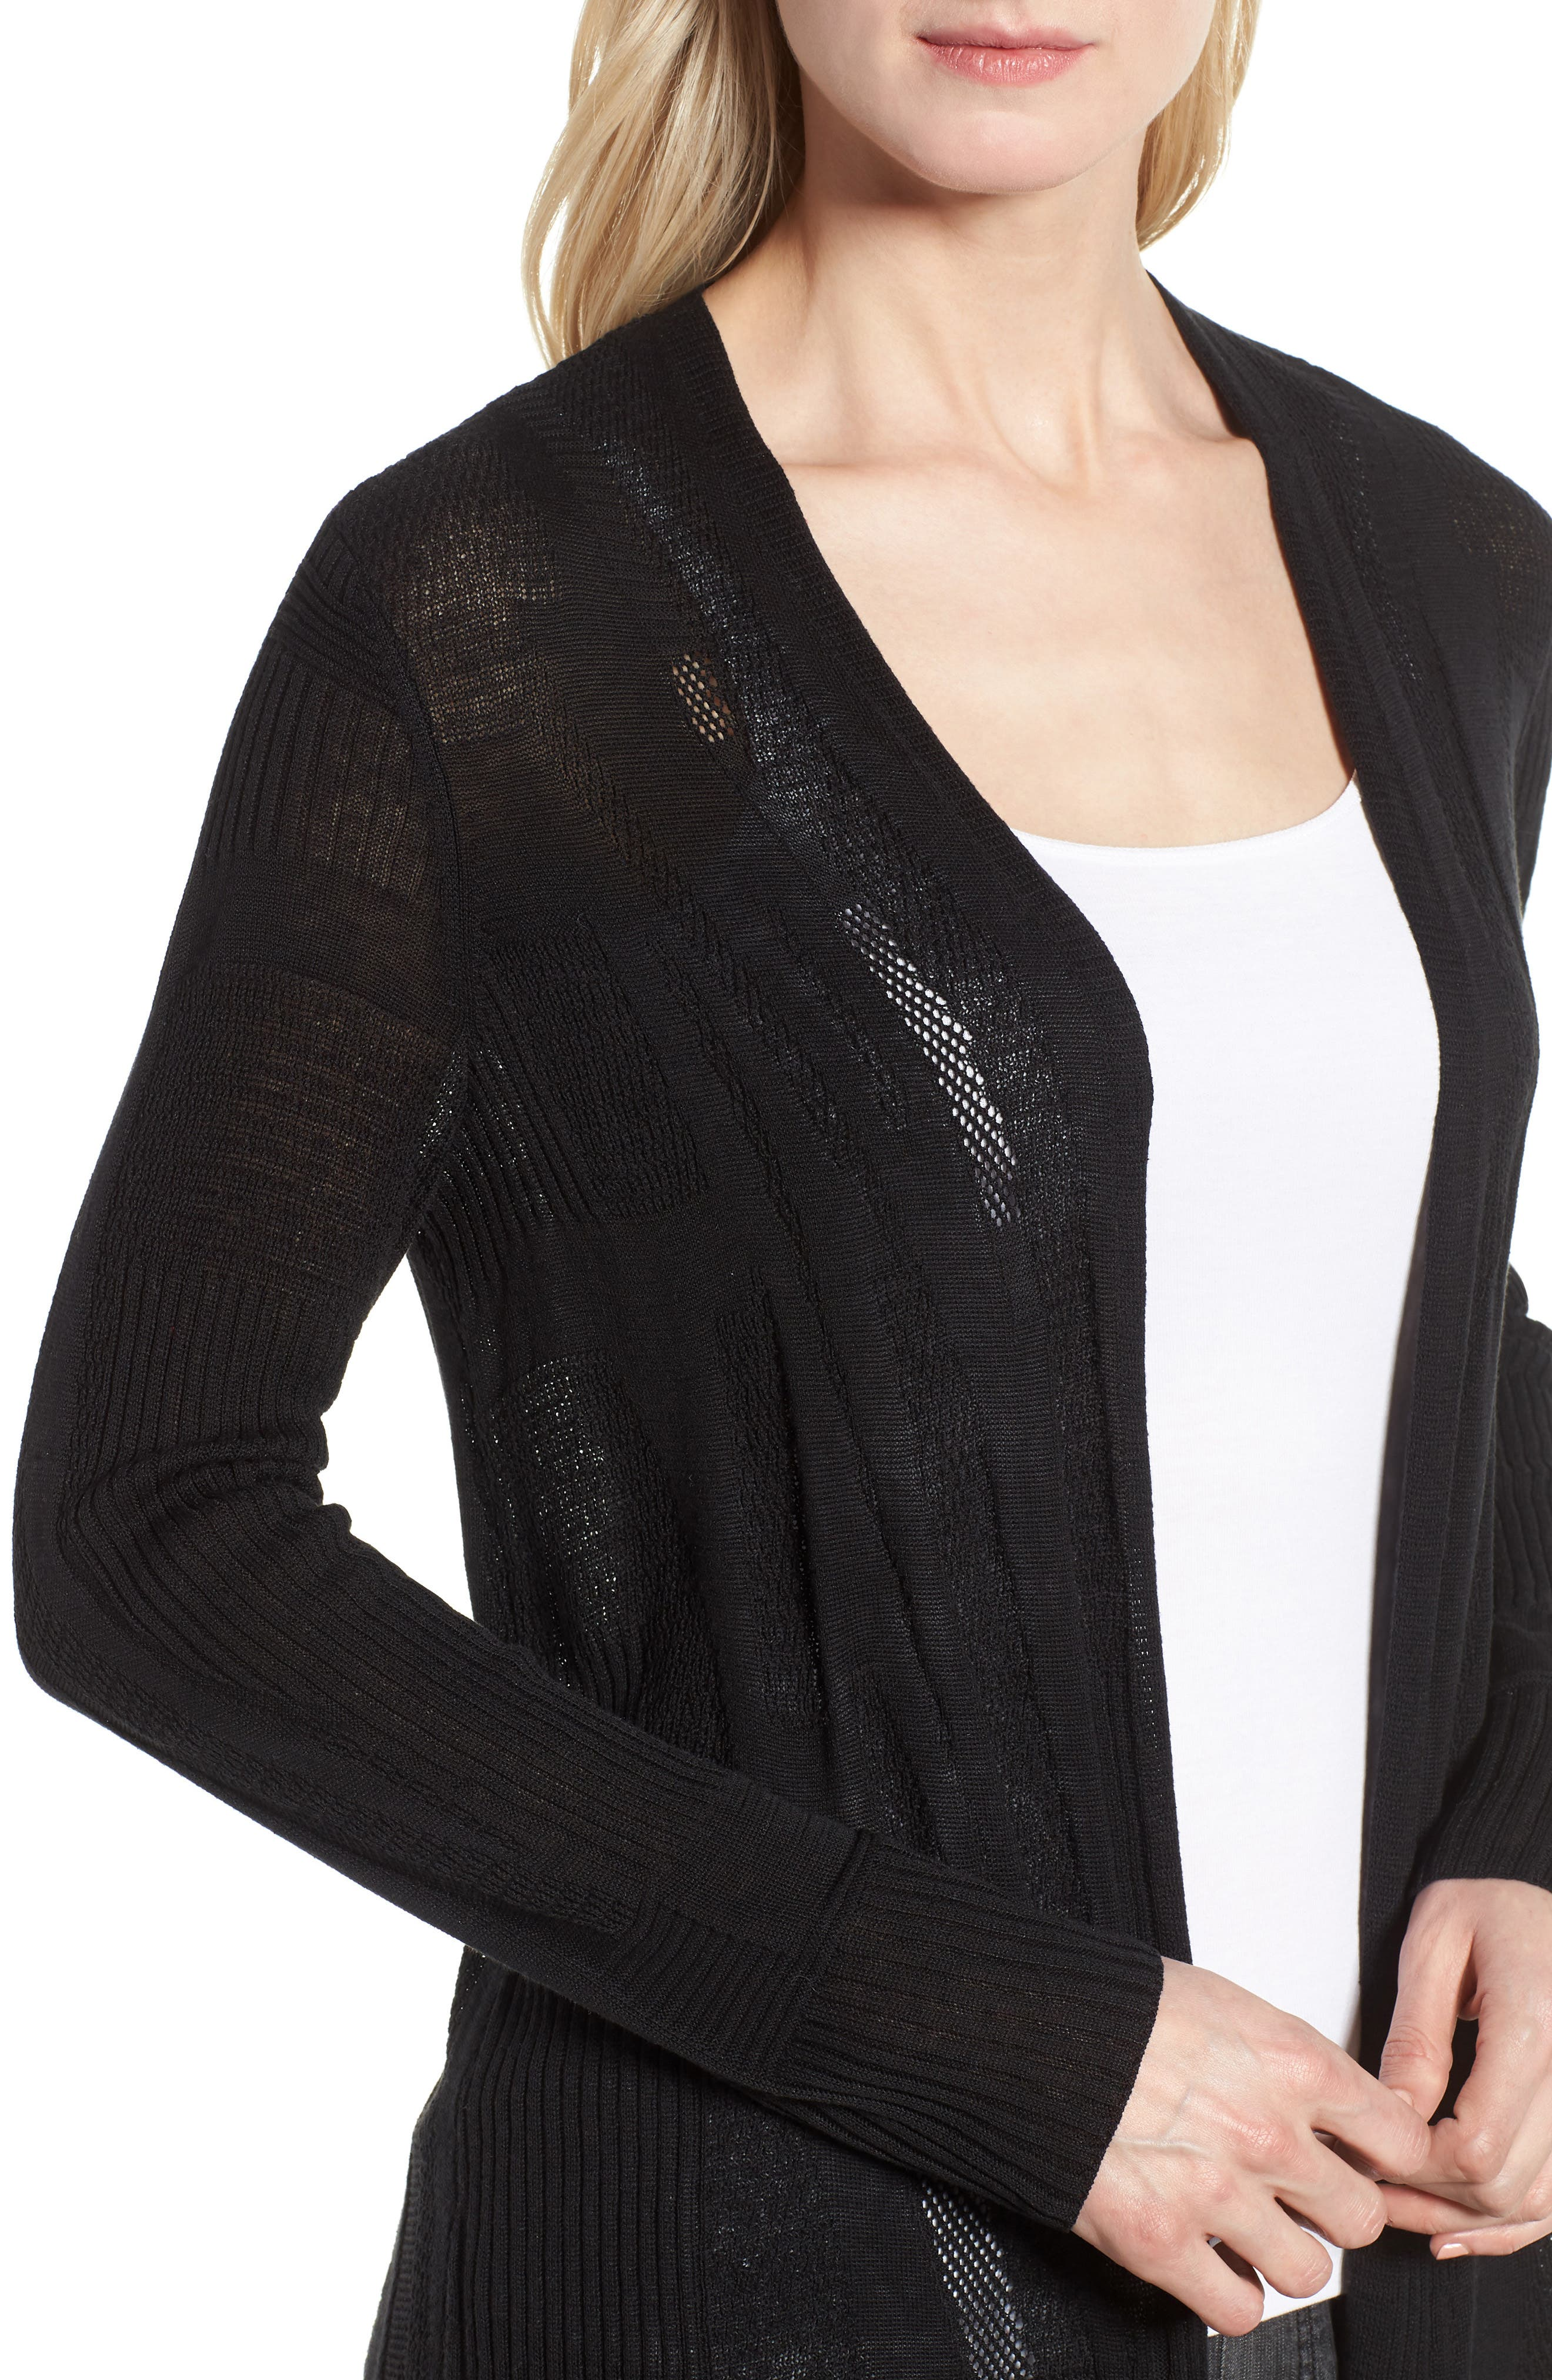 Simple Silk & Organic Linen Cardigan,                             Alternate thumbnail 4, color,                             001